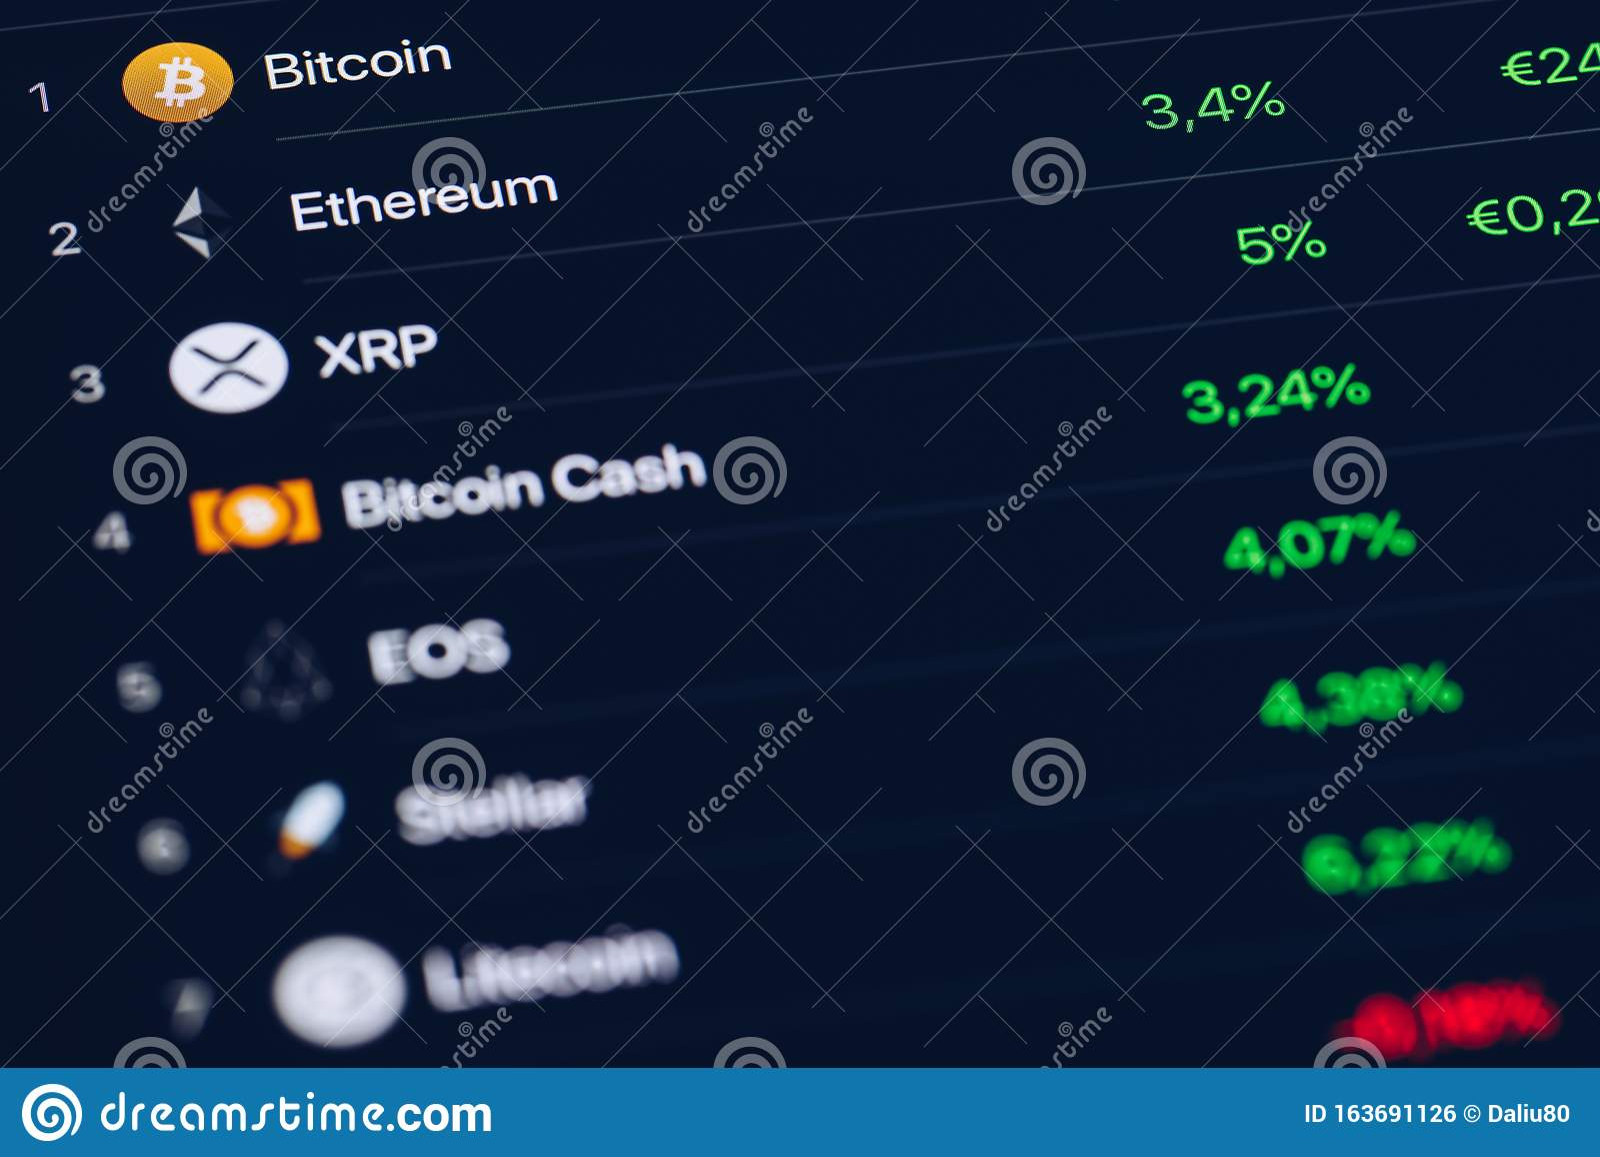 virtual coins value